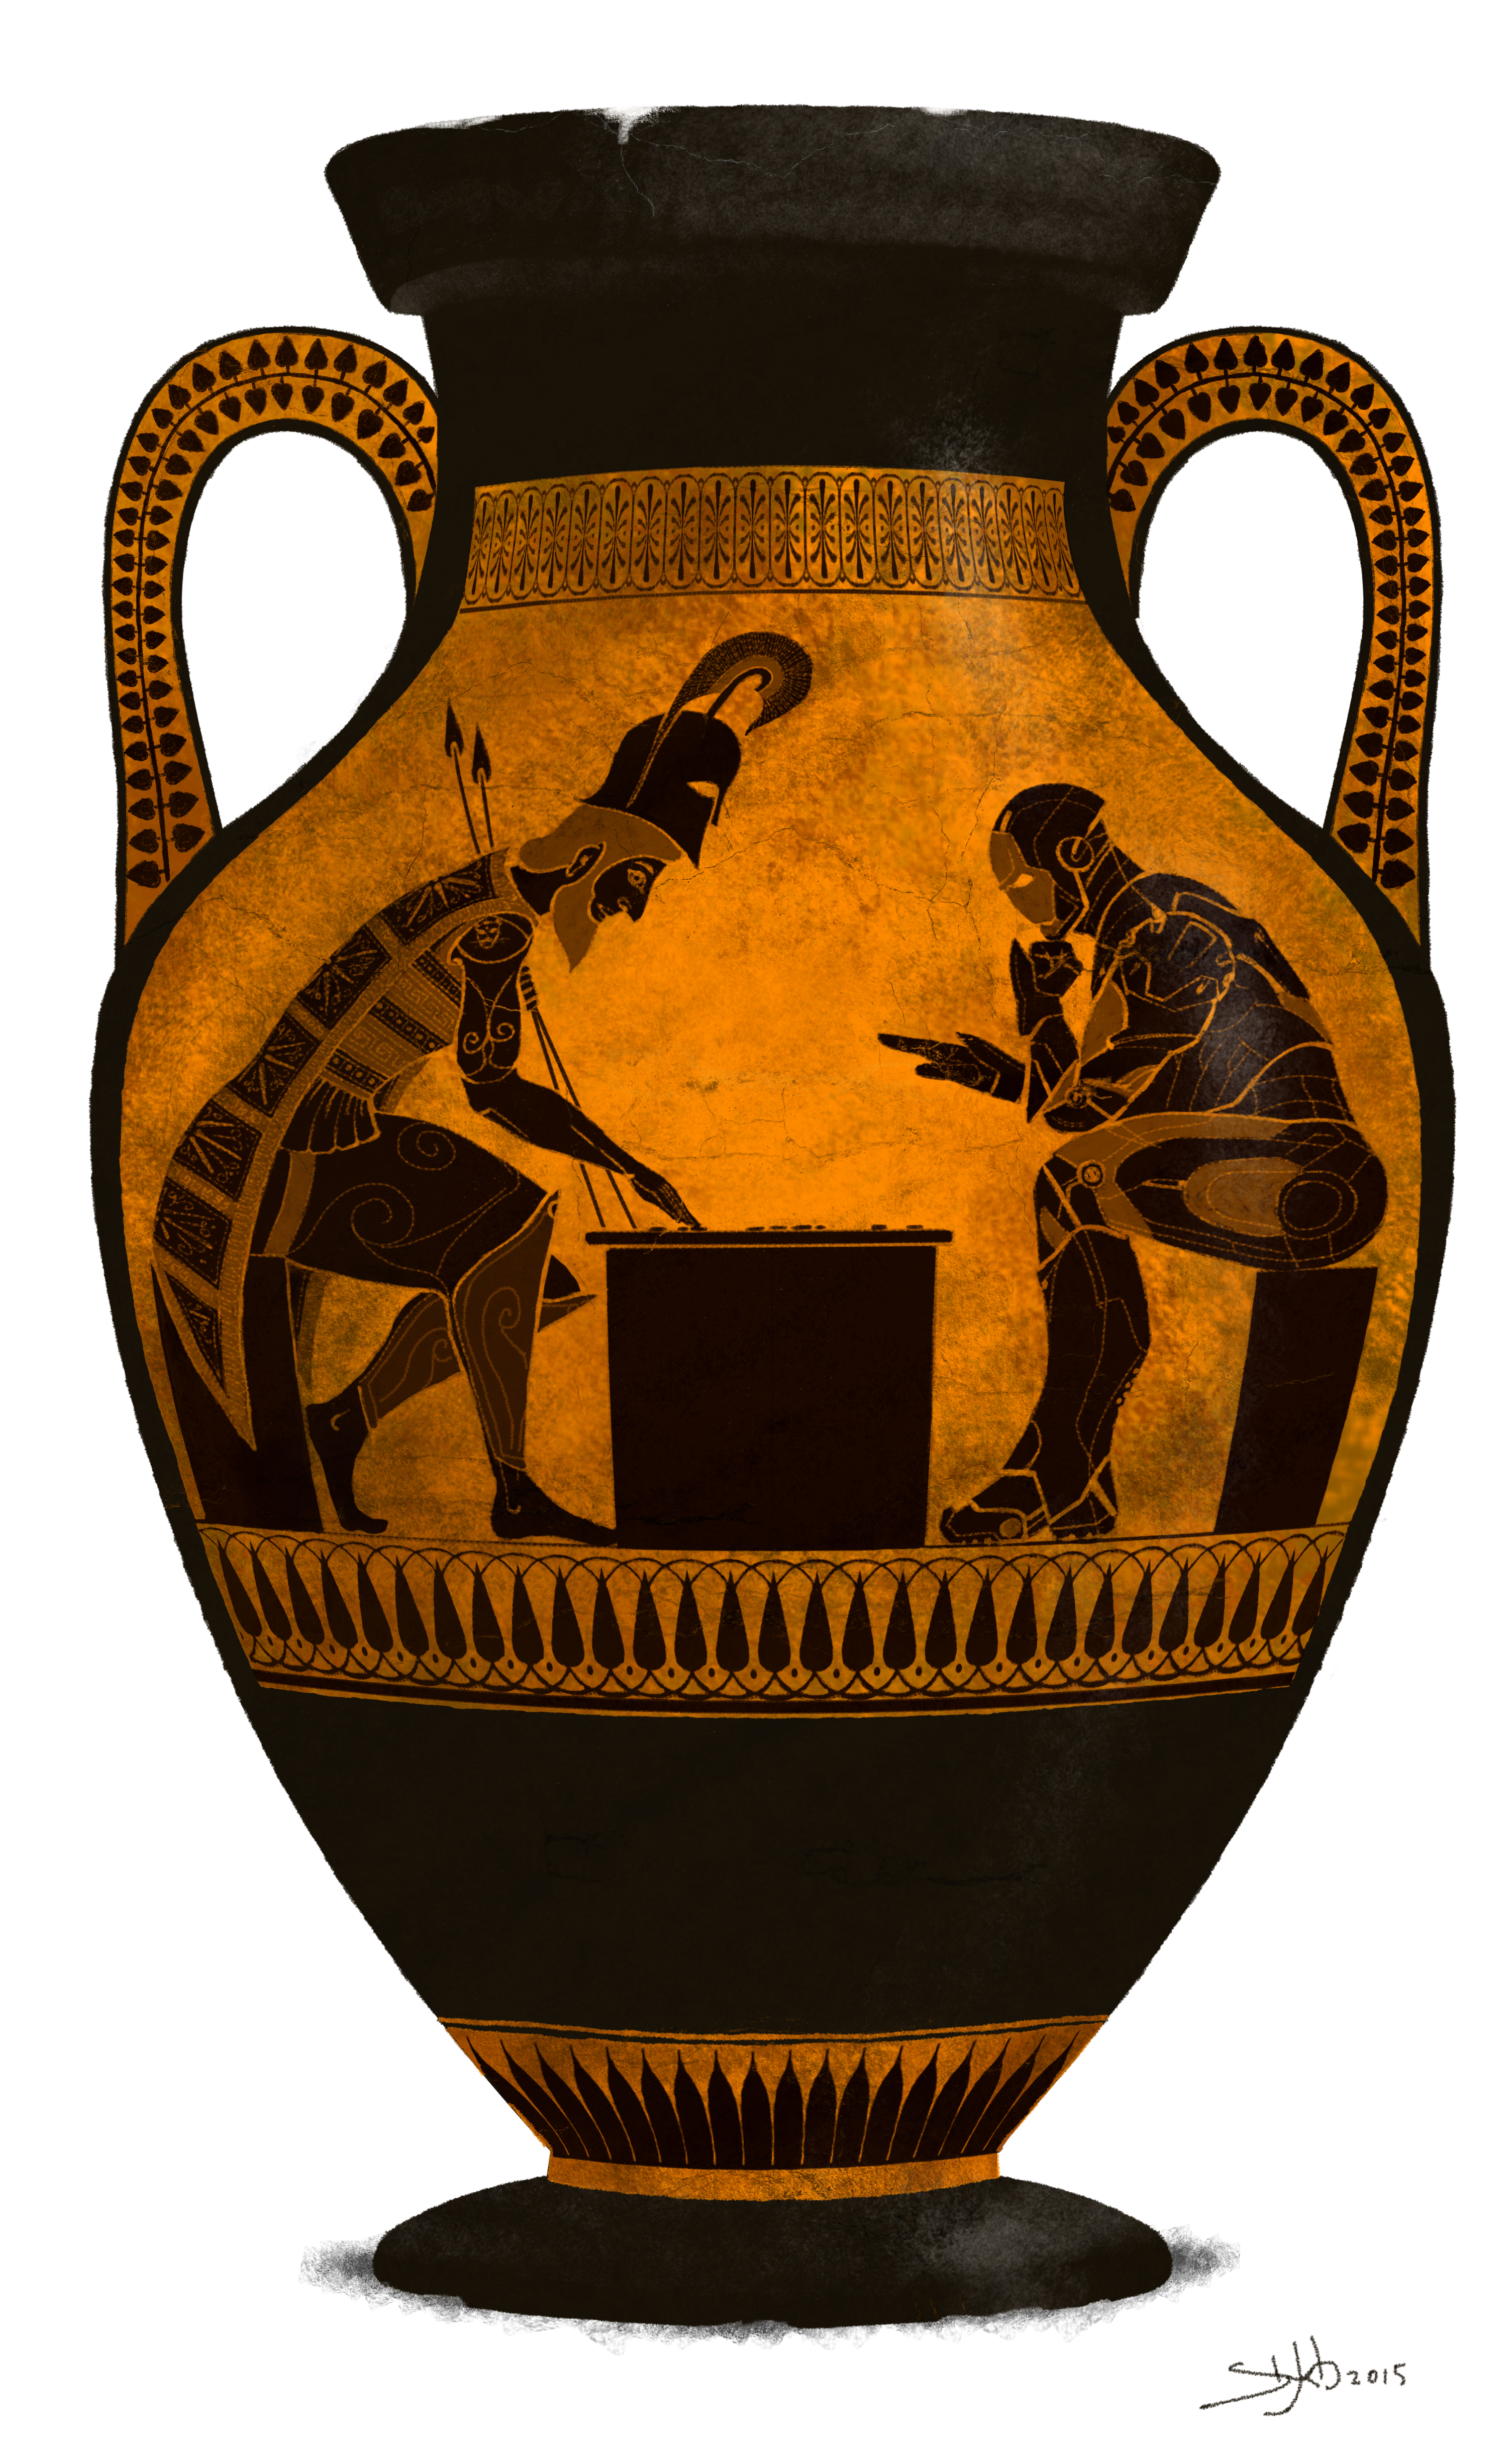 Prediction on vase